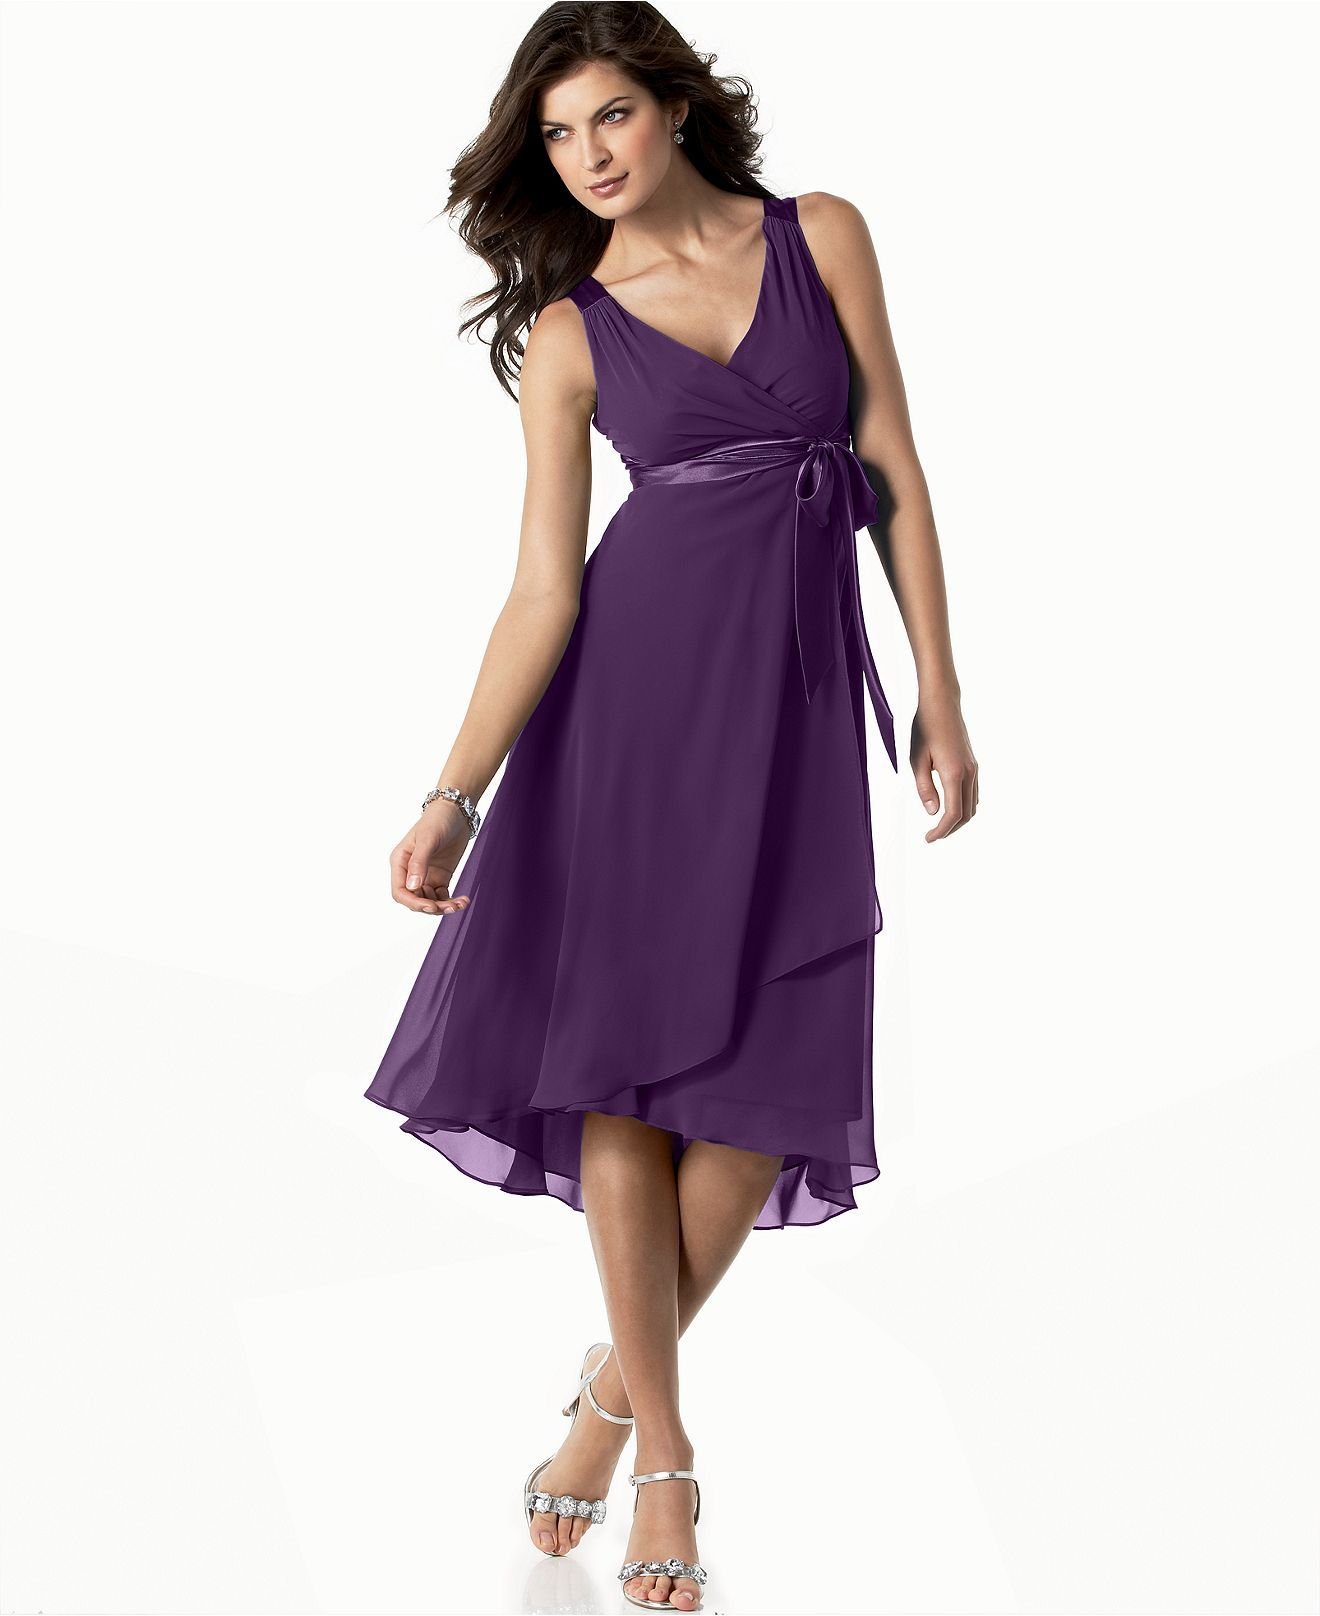 Evan Picone Dress Sleeveless Satin Tie Womens Dresses Macy s